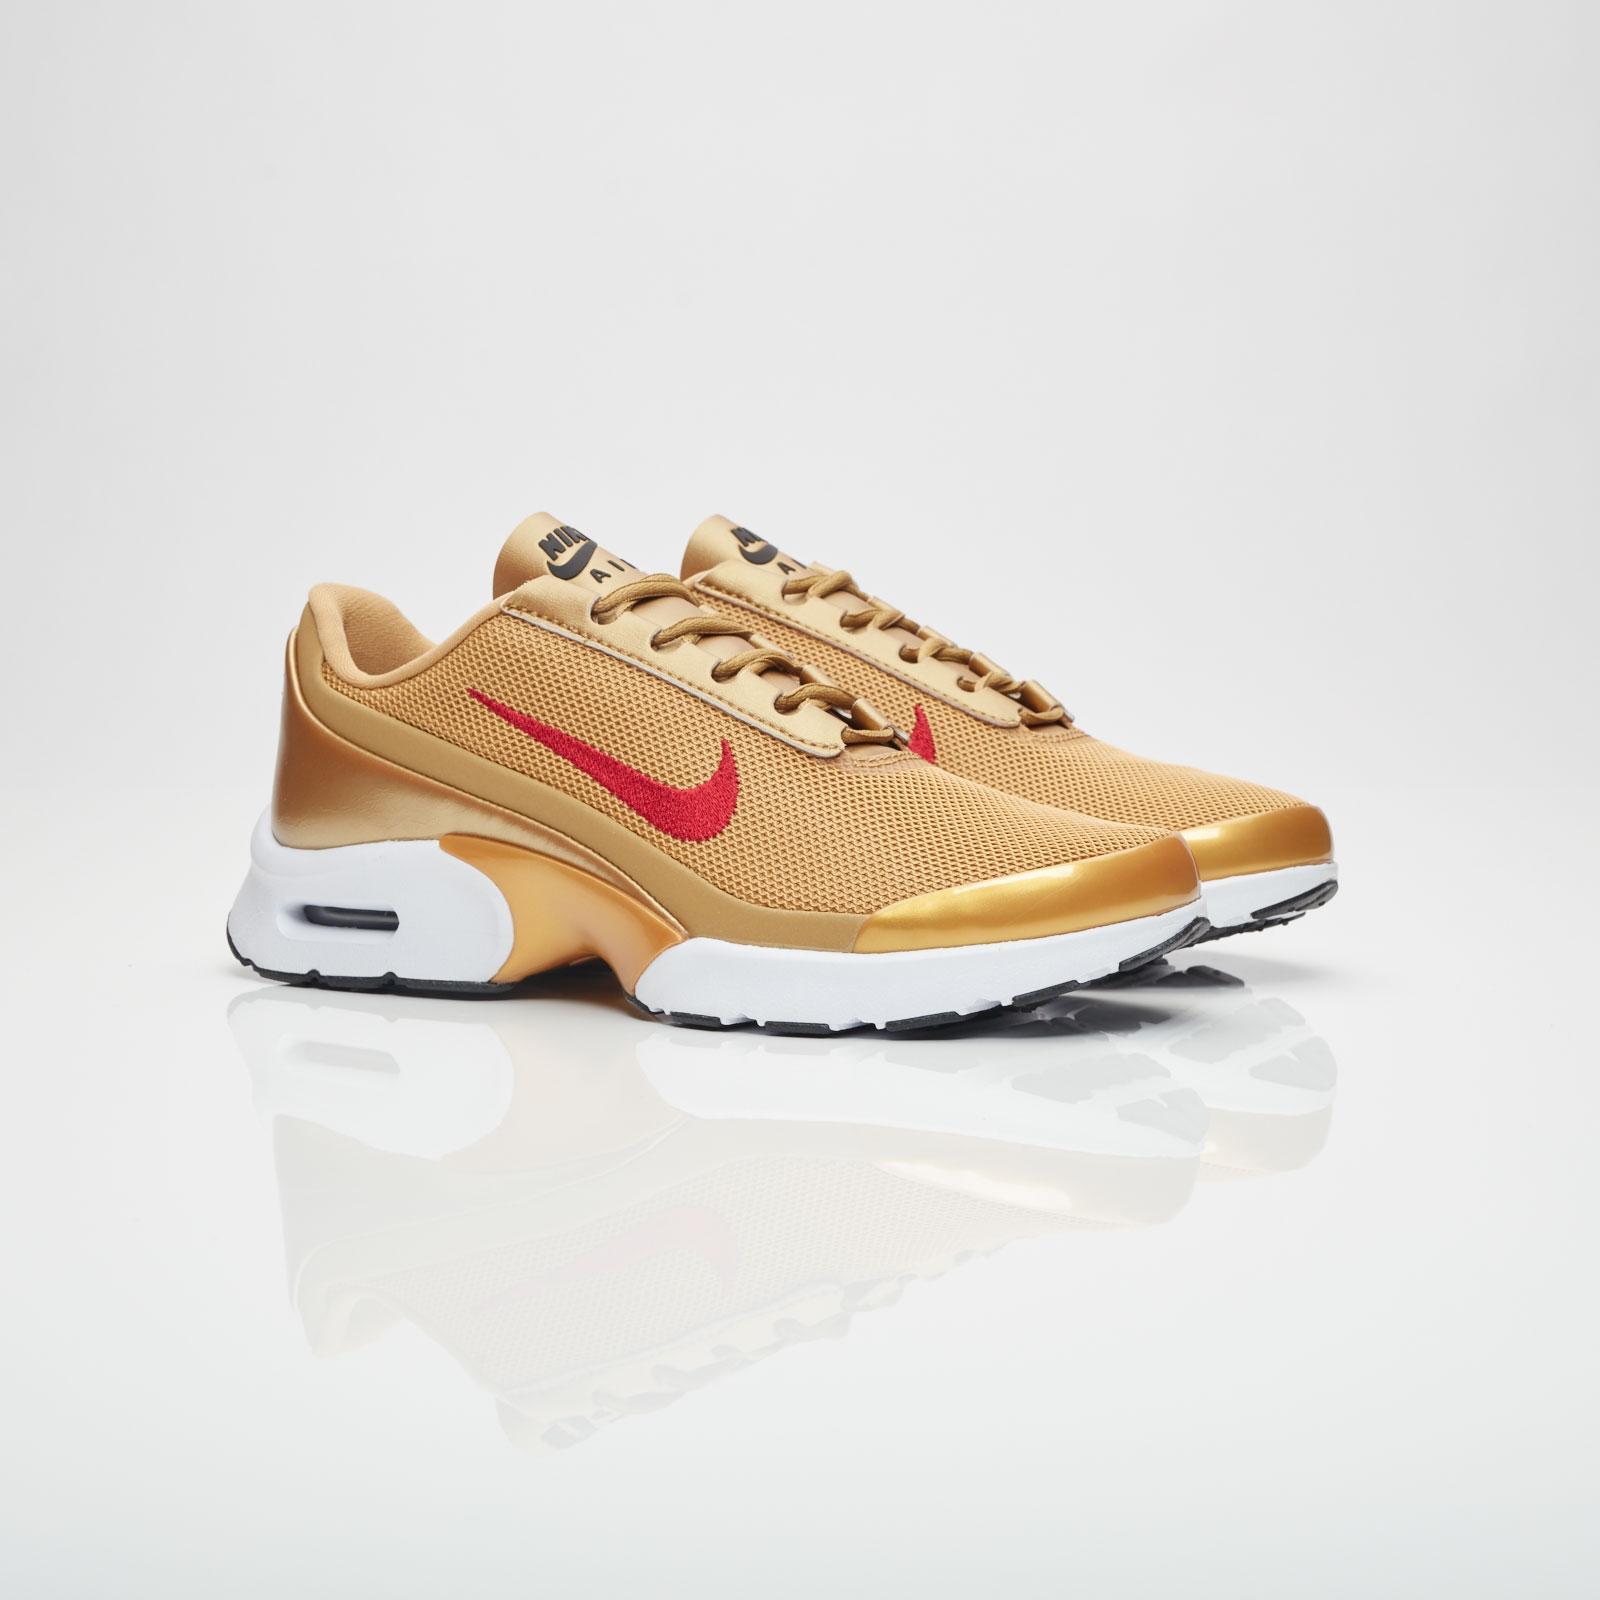 d76c443287 Nike Air Max Jewell QS - 910313-700 - Sneakersnstuff | sneakers ...